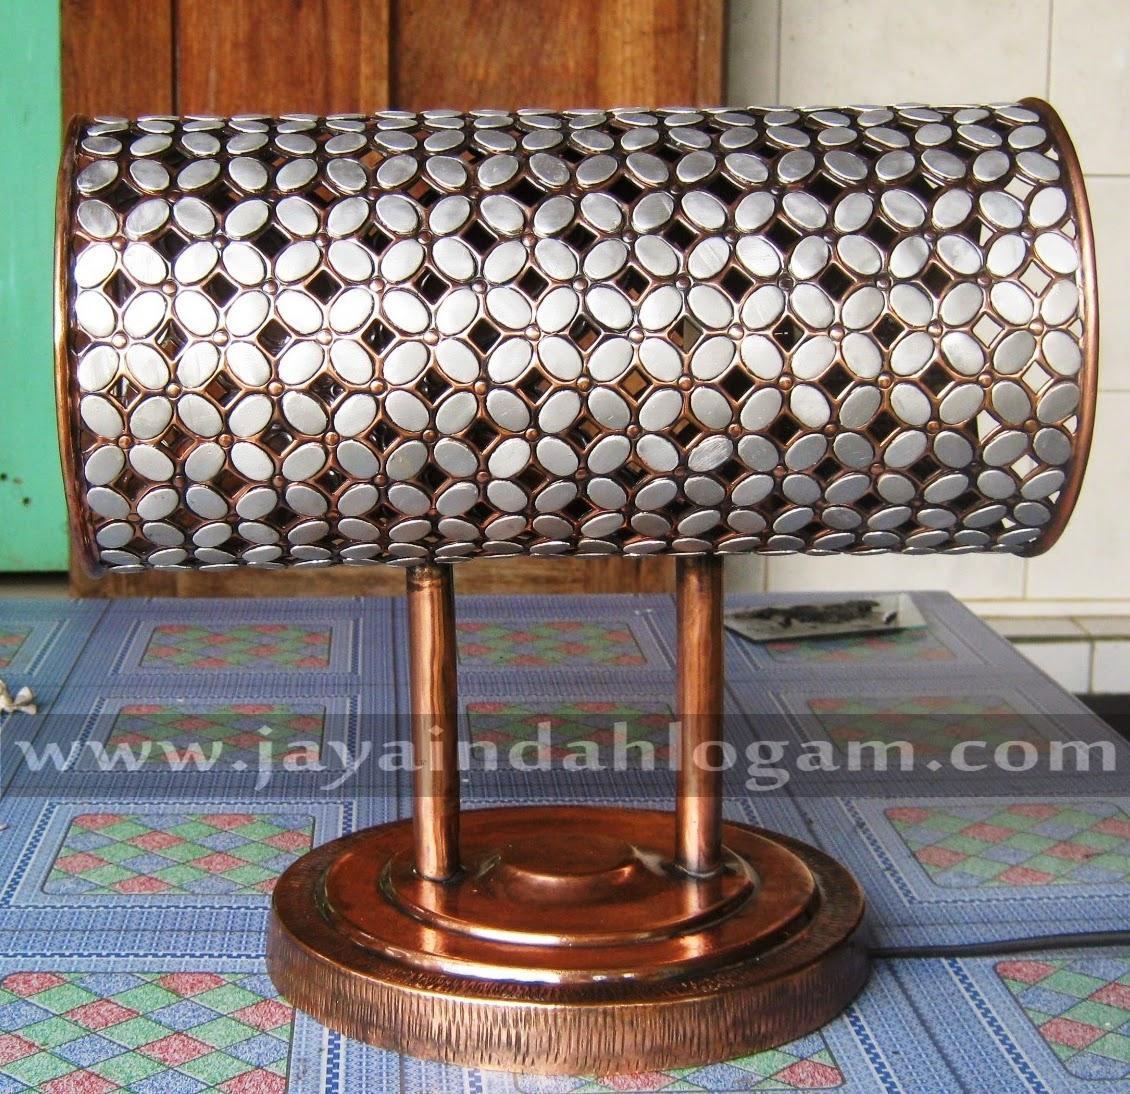 http://www.jayaindahlogam.com/2014/08/kerajinan-lampu-dinding_6.html